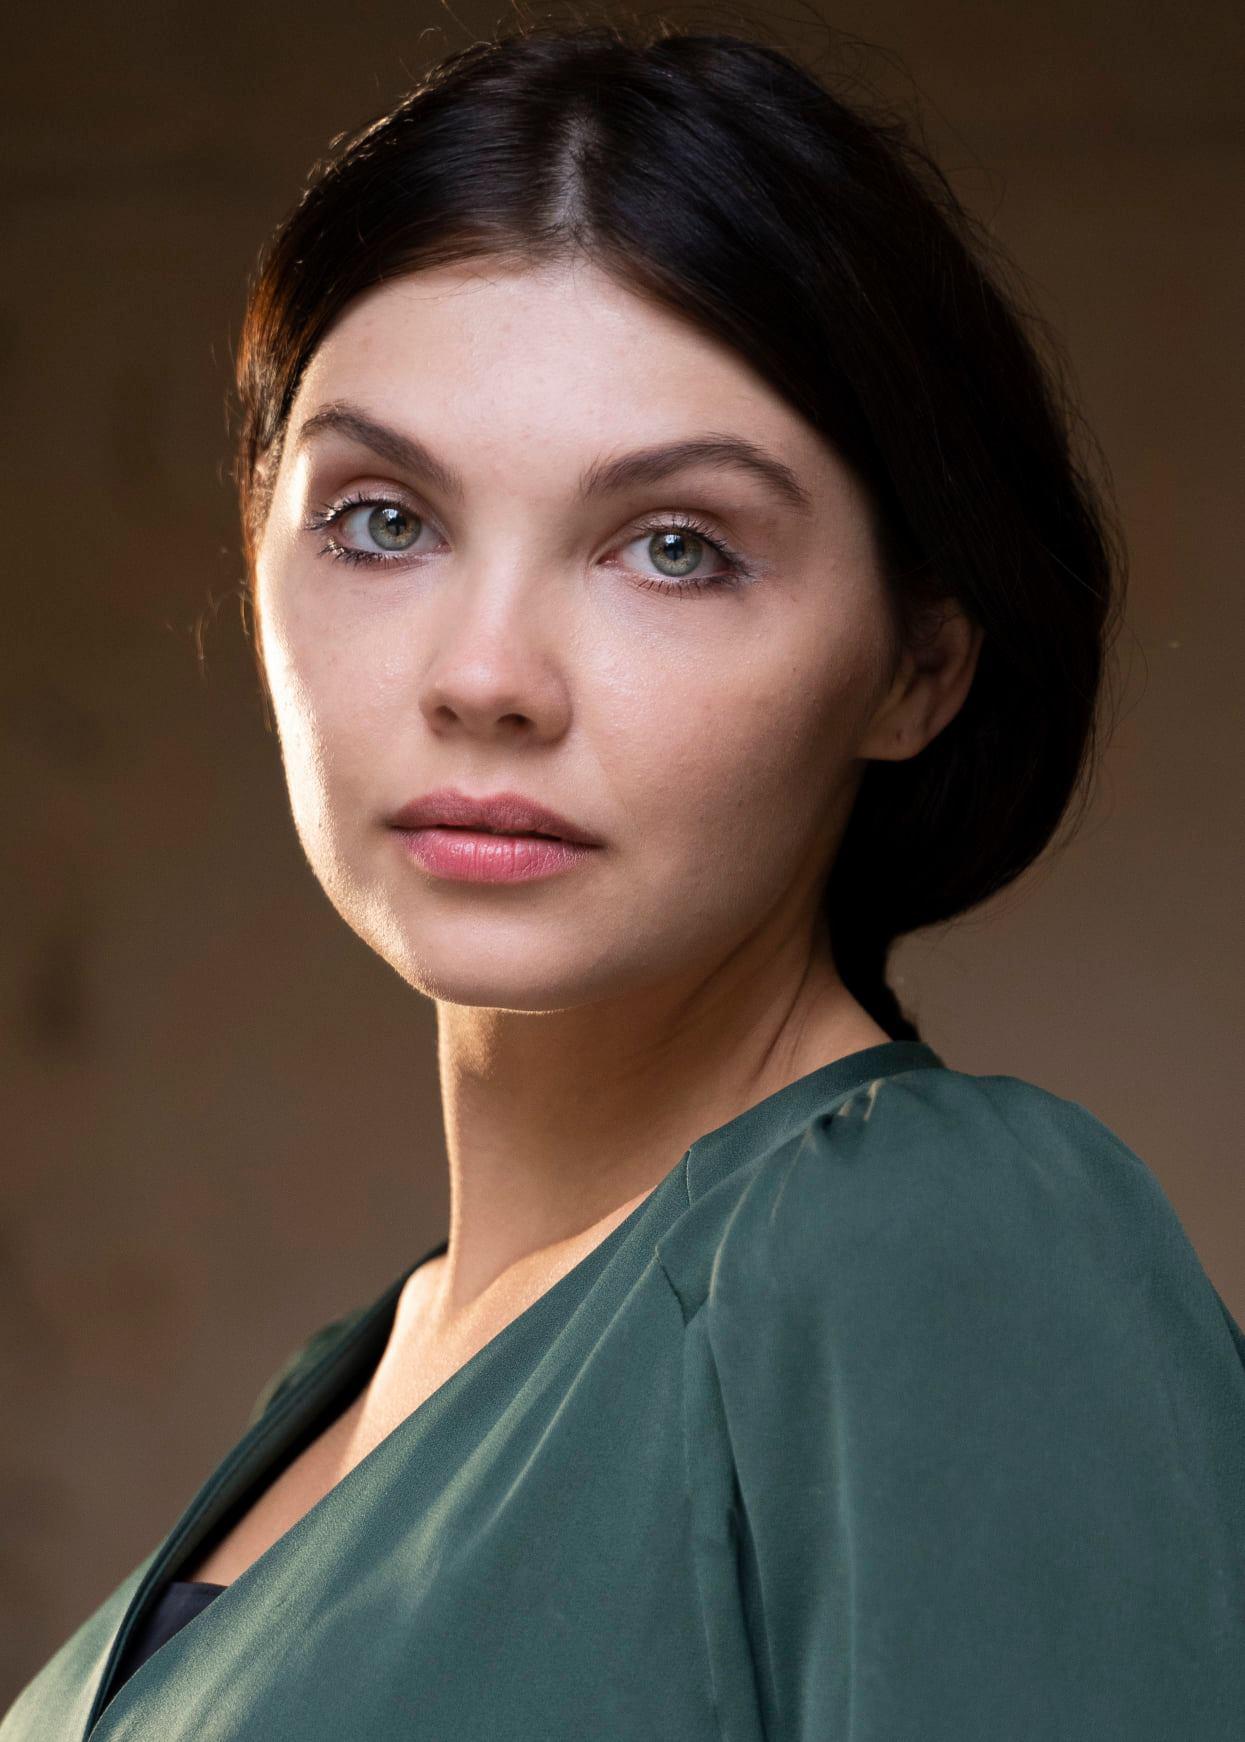 Anna Skladchikova